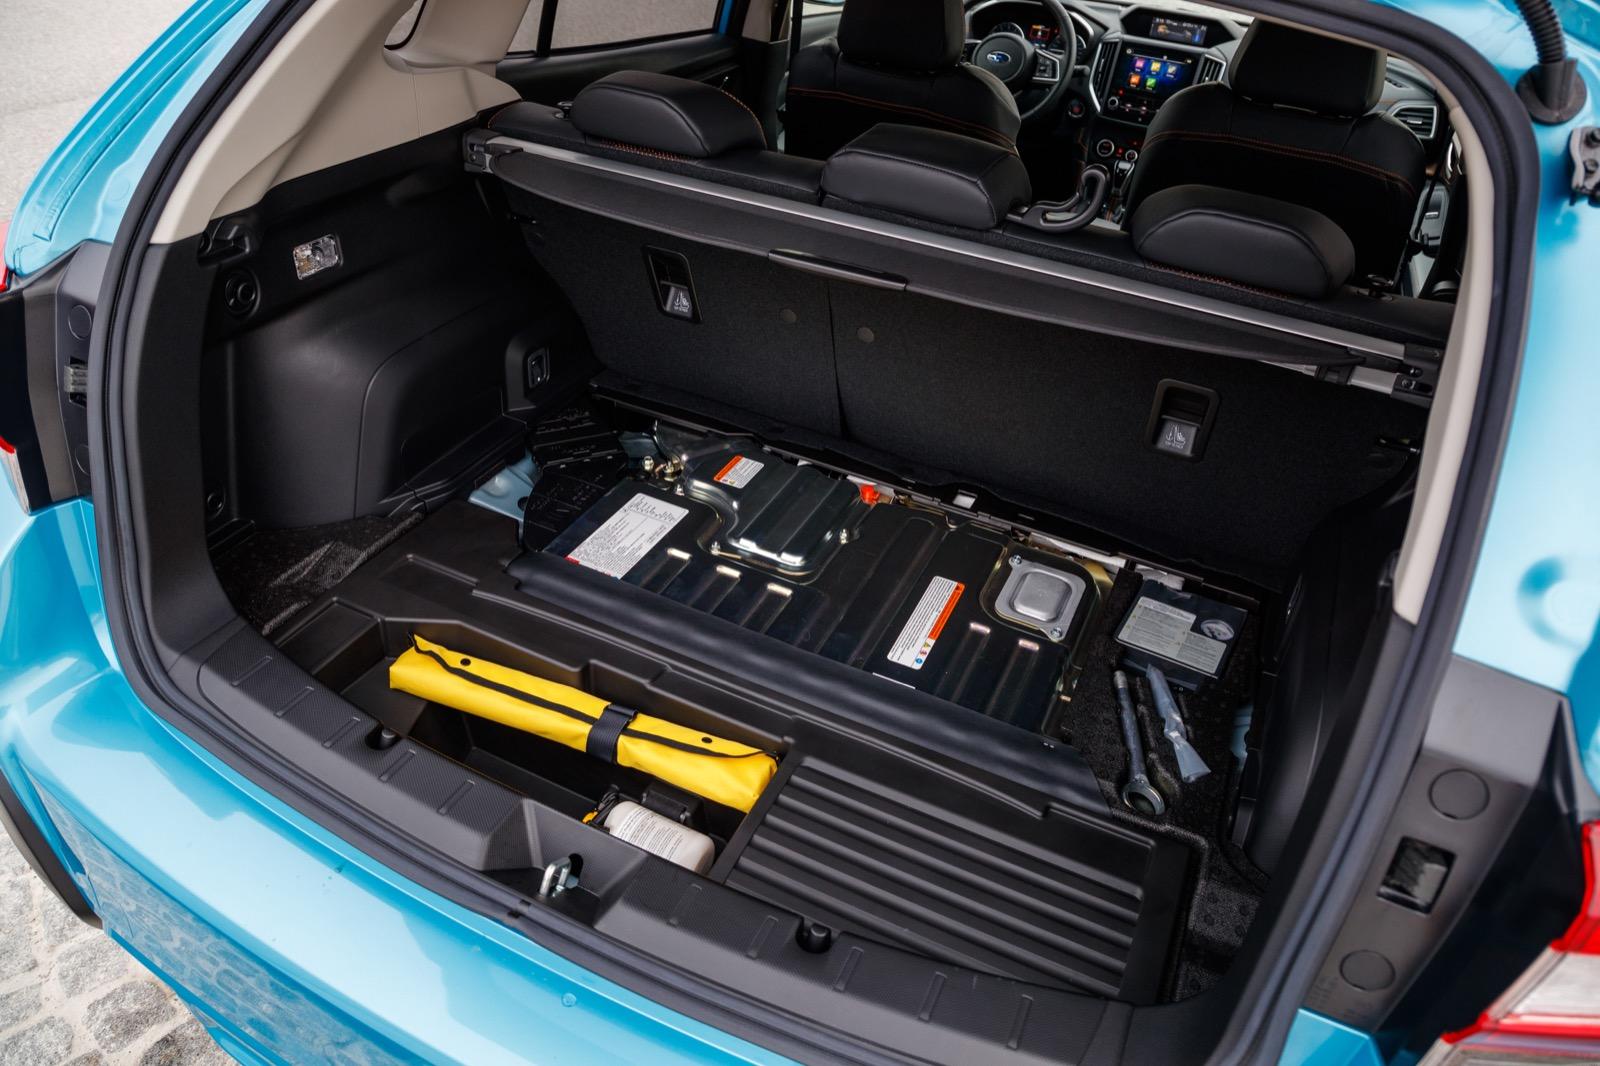 Subaru Xv Ecohybrid Bateria (1)